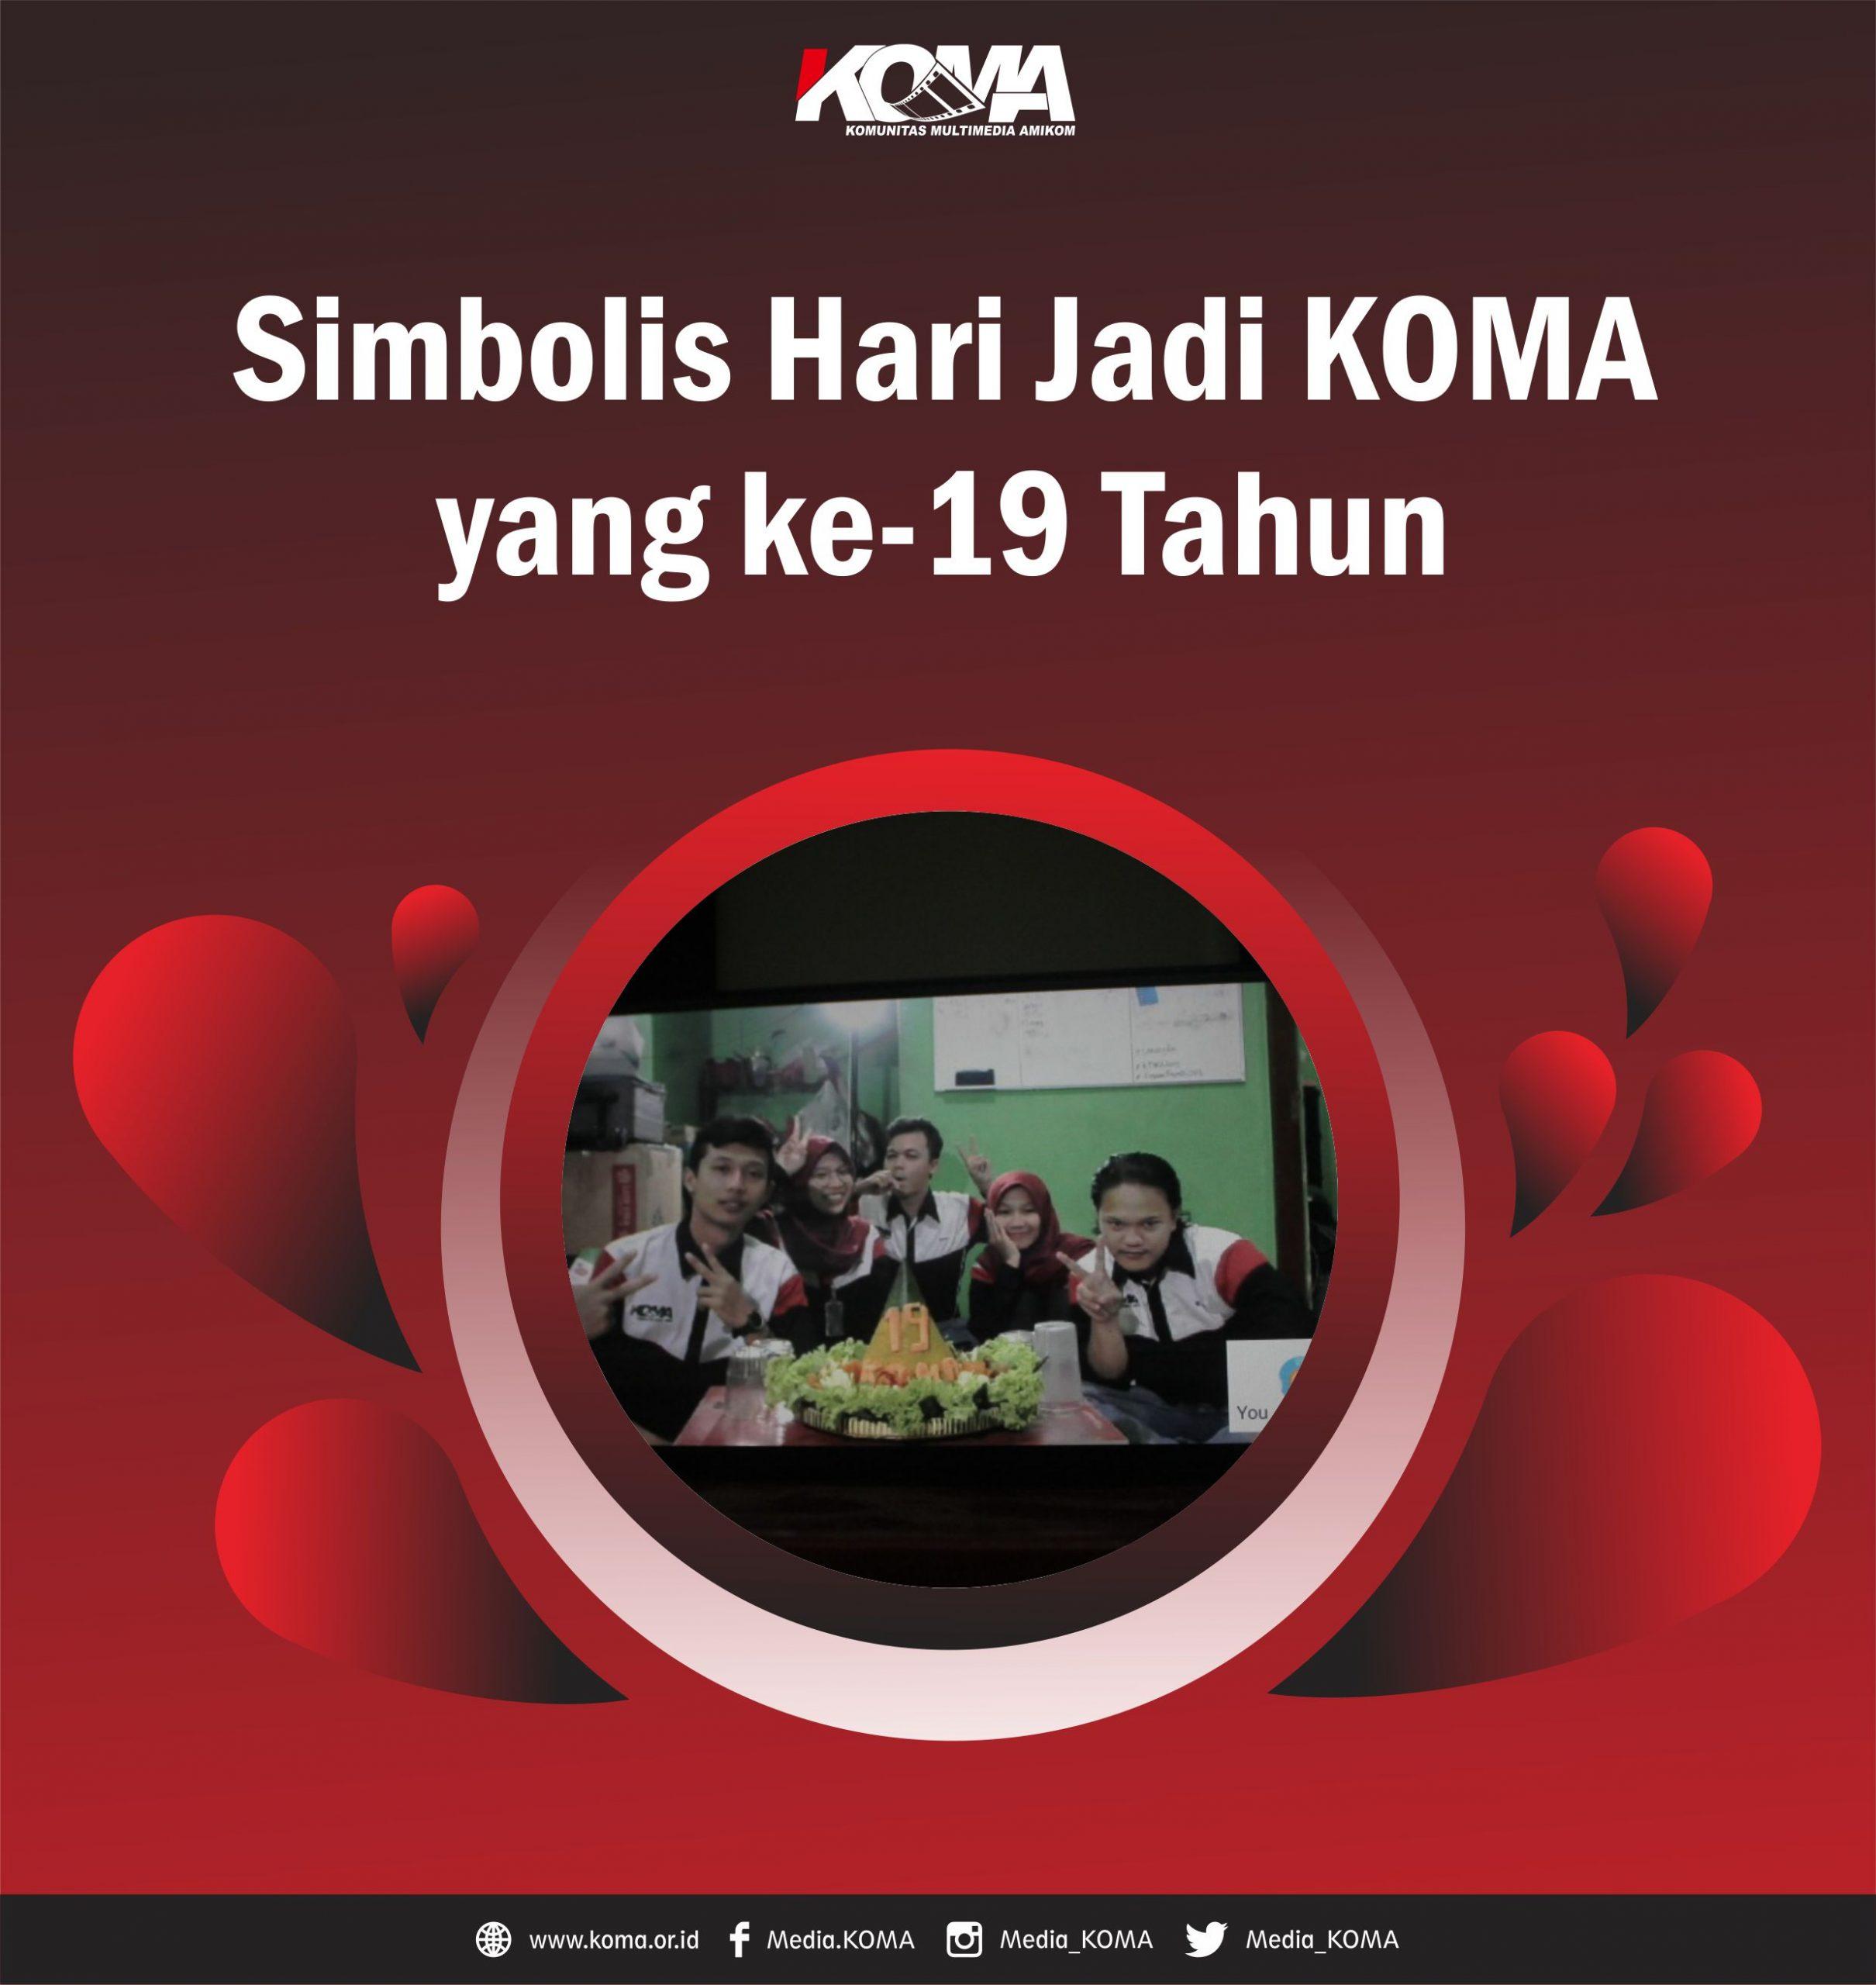 Simbolis_Hari_Jadi_KOMA1